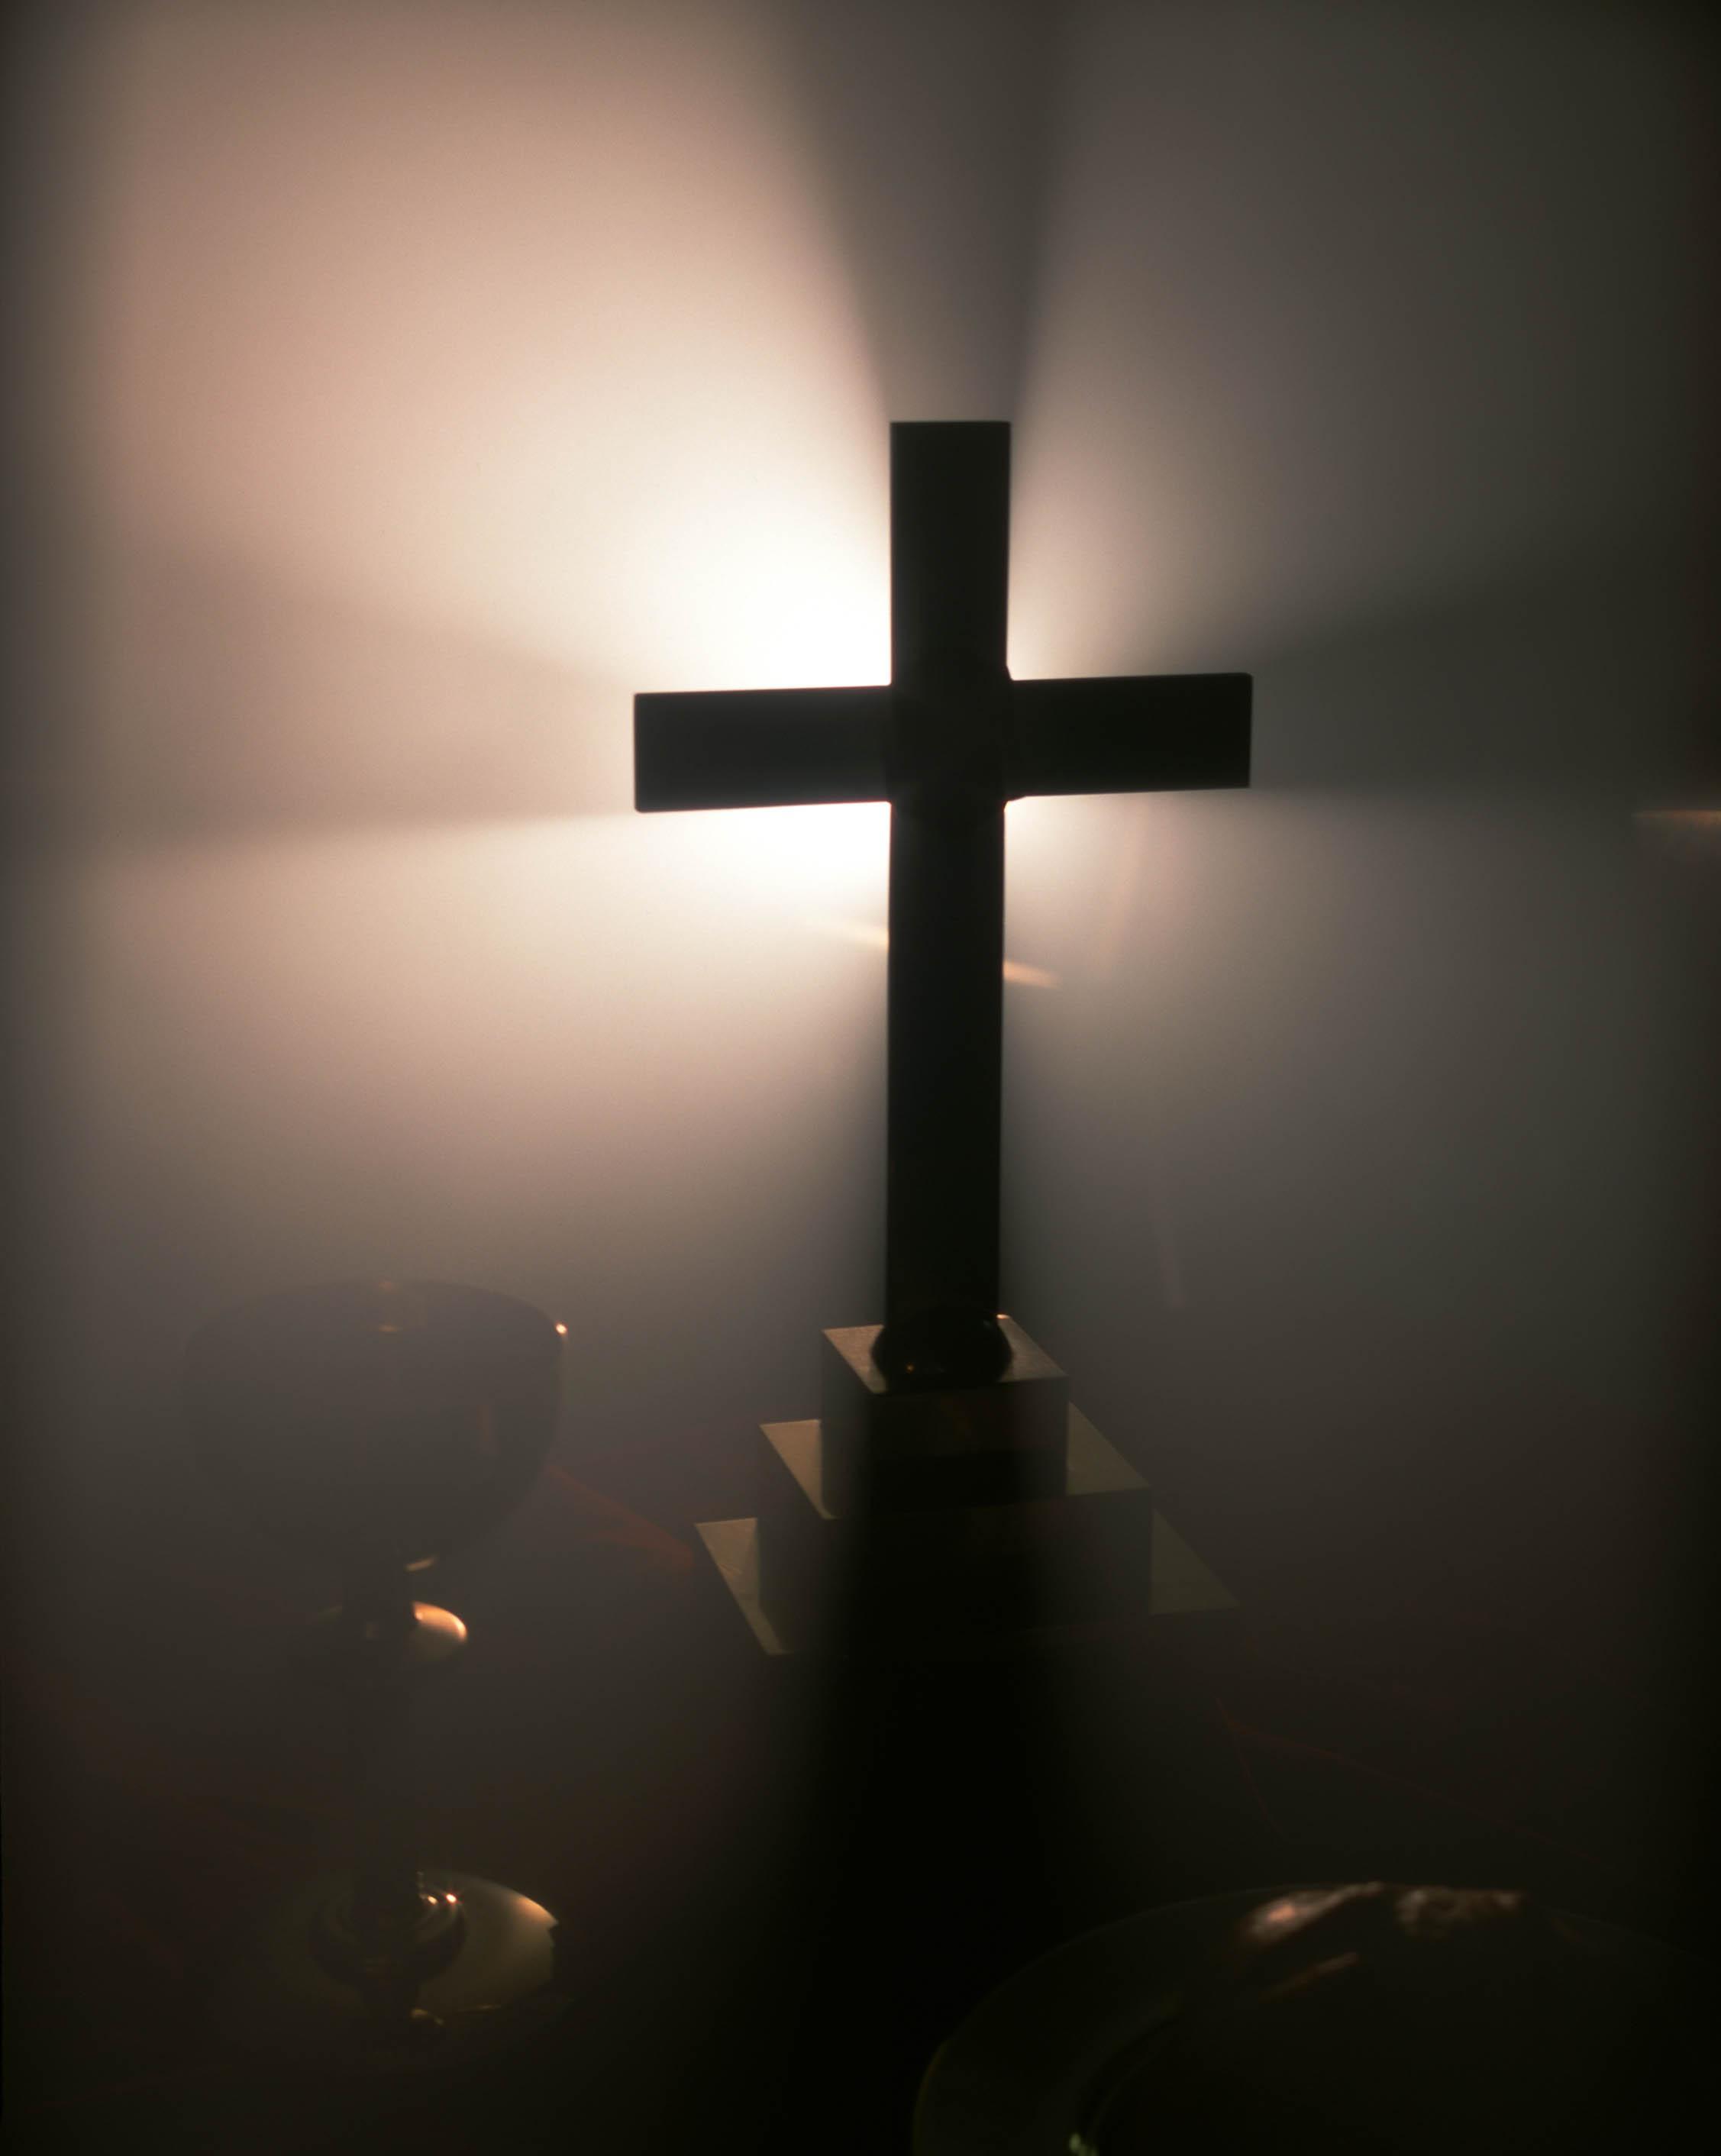 calvary cross pics 0504 calvary cross pics 0505 calvary cross 2254x2824